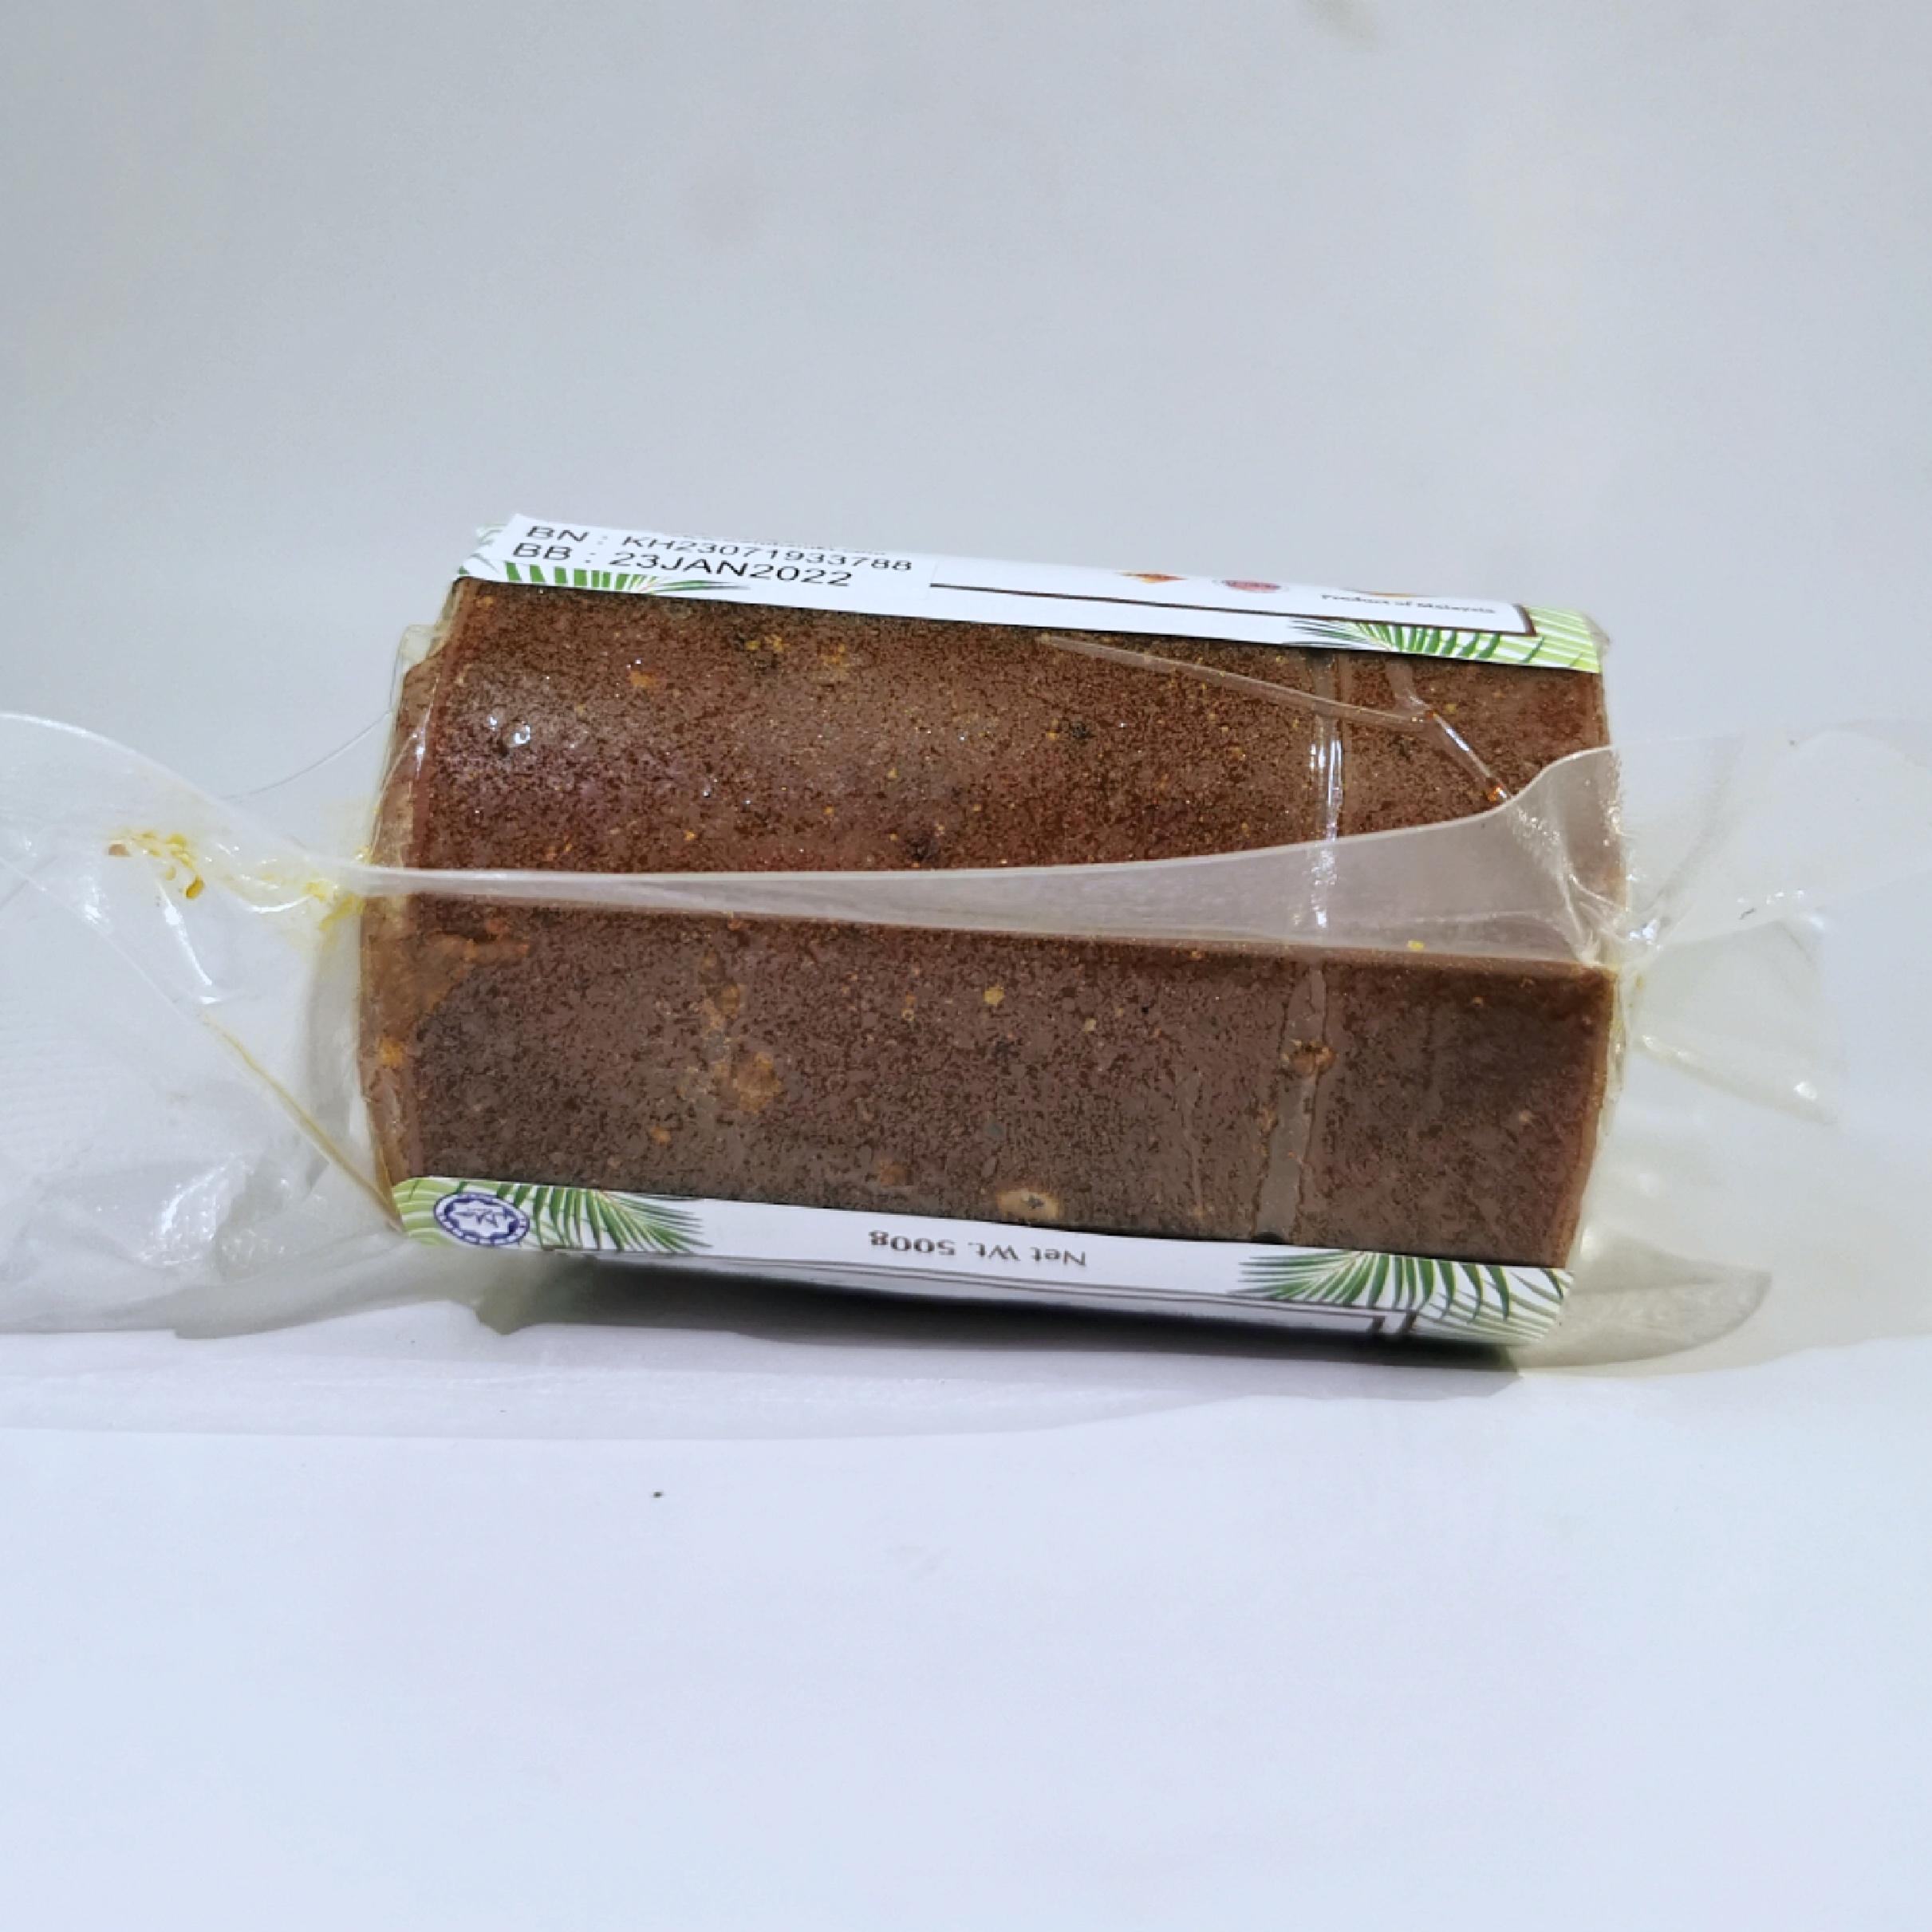 Kicco Coconut Rock Sugar / Premium quality 100% natural aromatic pure & unrefined Malaysian Coconut Sap/Nectar Sweet Taste